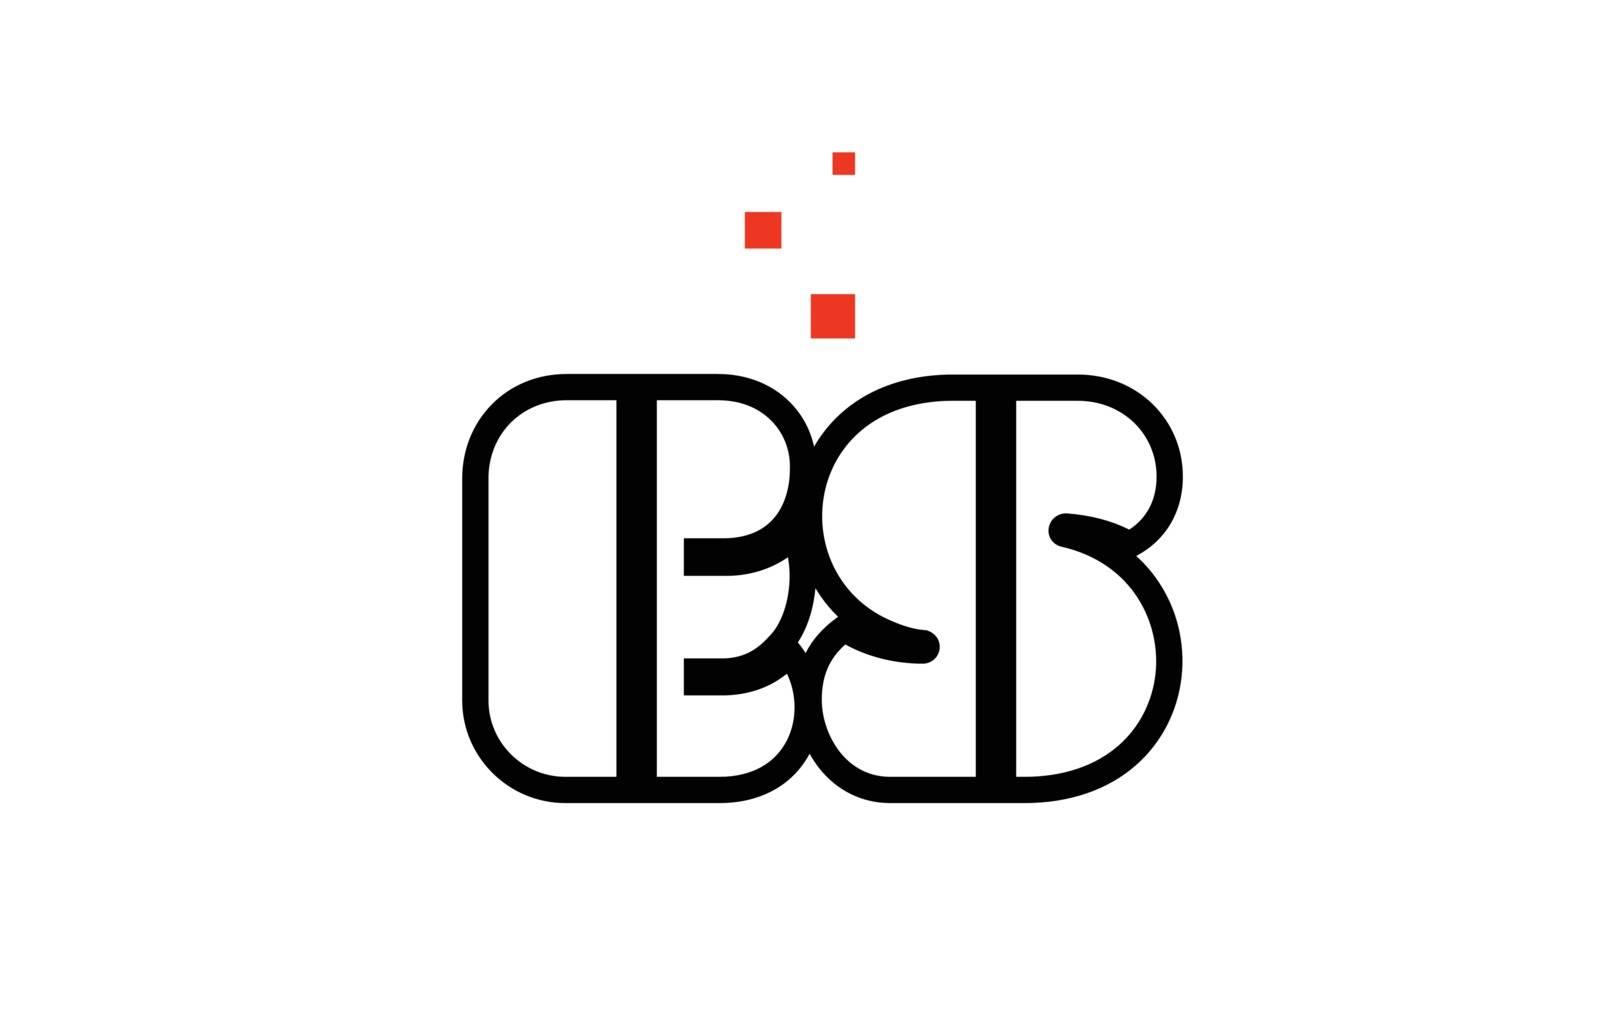 ES E S black white red alphabet letter combination logo icon des by dragomirescu